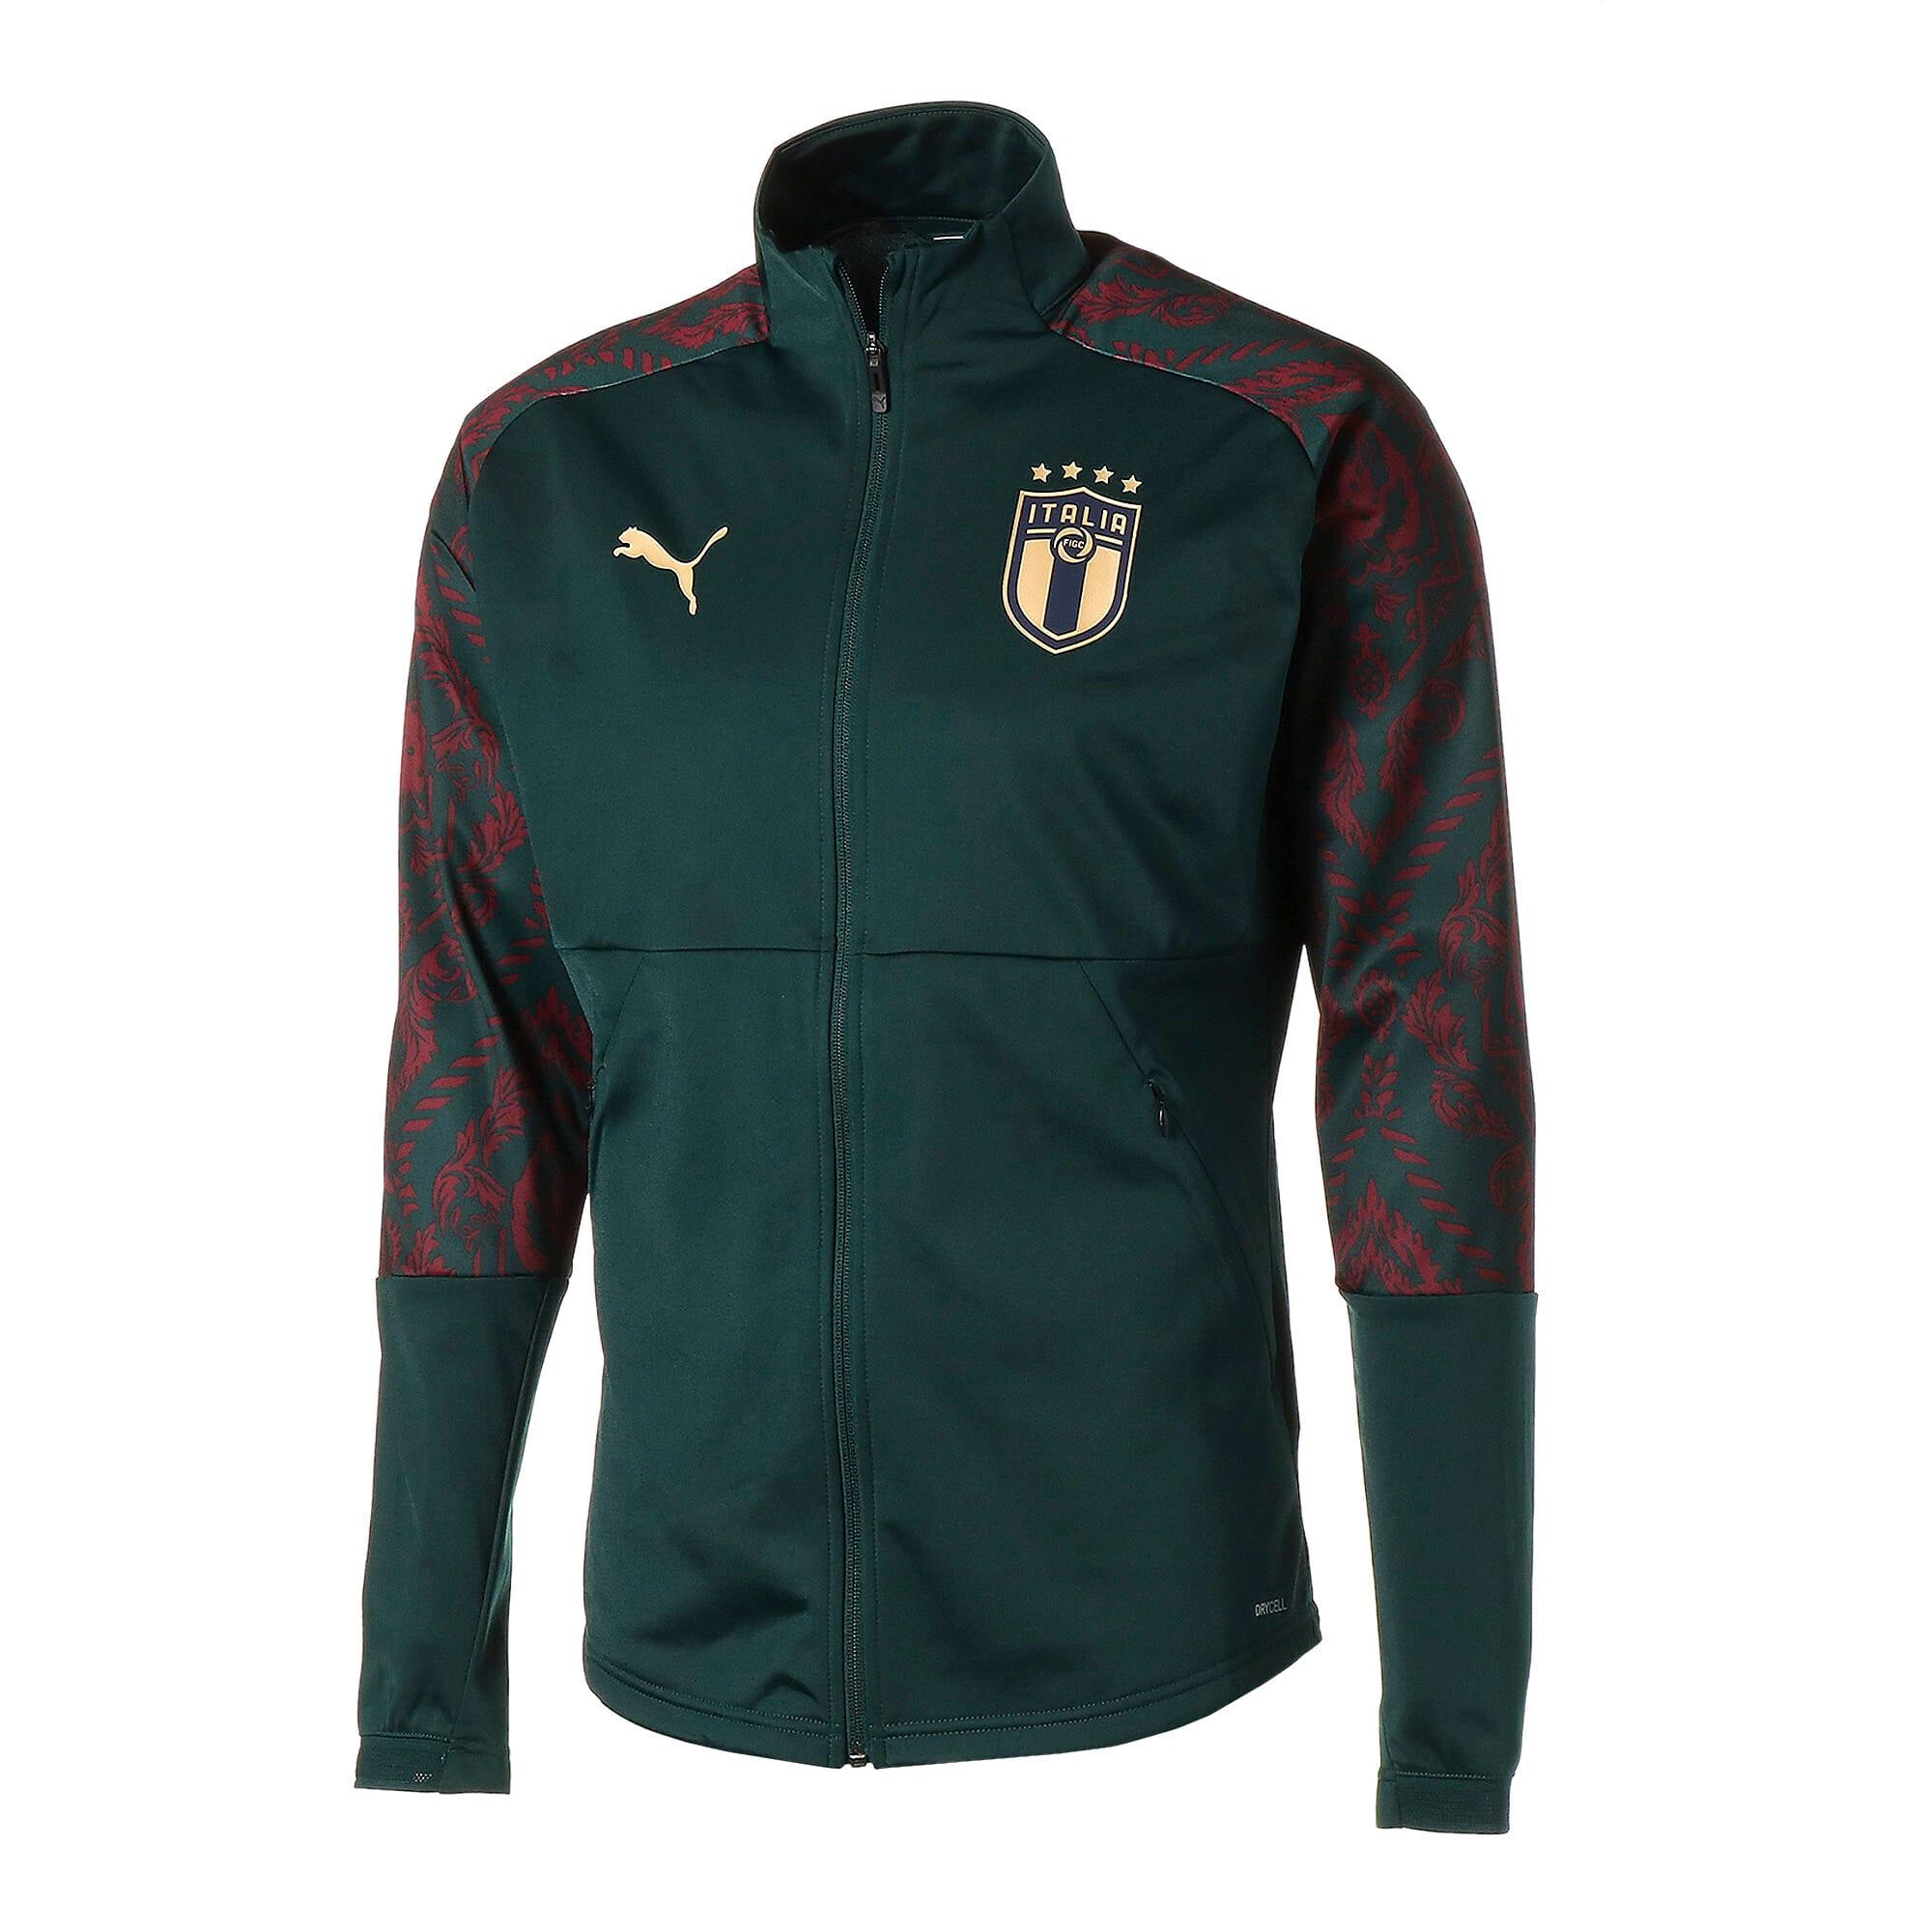 Thumbnail 1 of FIGC イタリア RENAISSANCE スタジアム ジャケット, Ponderosa Pine-Cordovan, medium-JPN